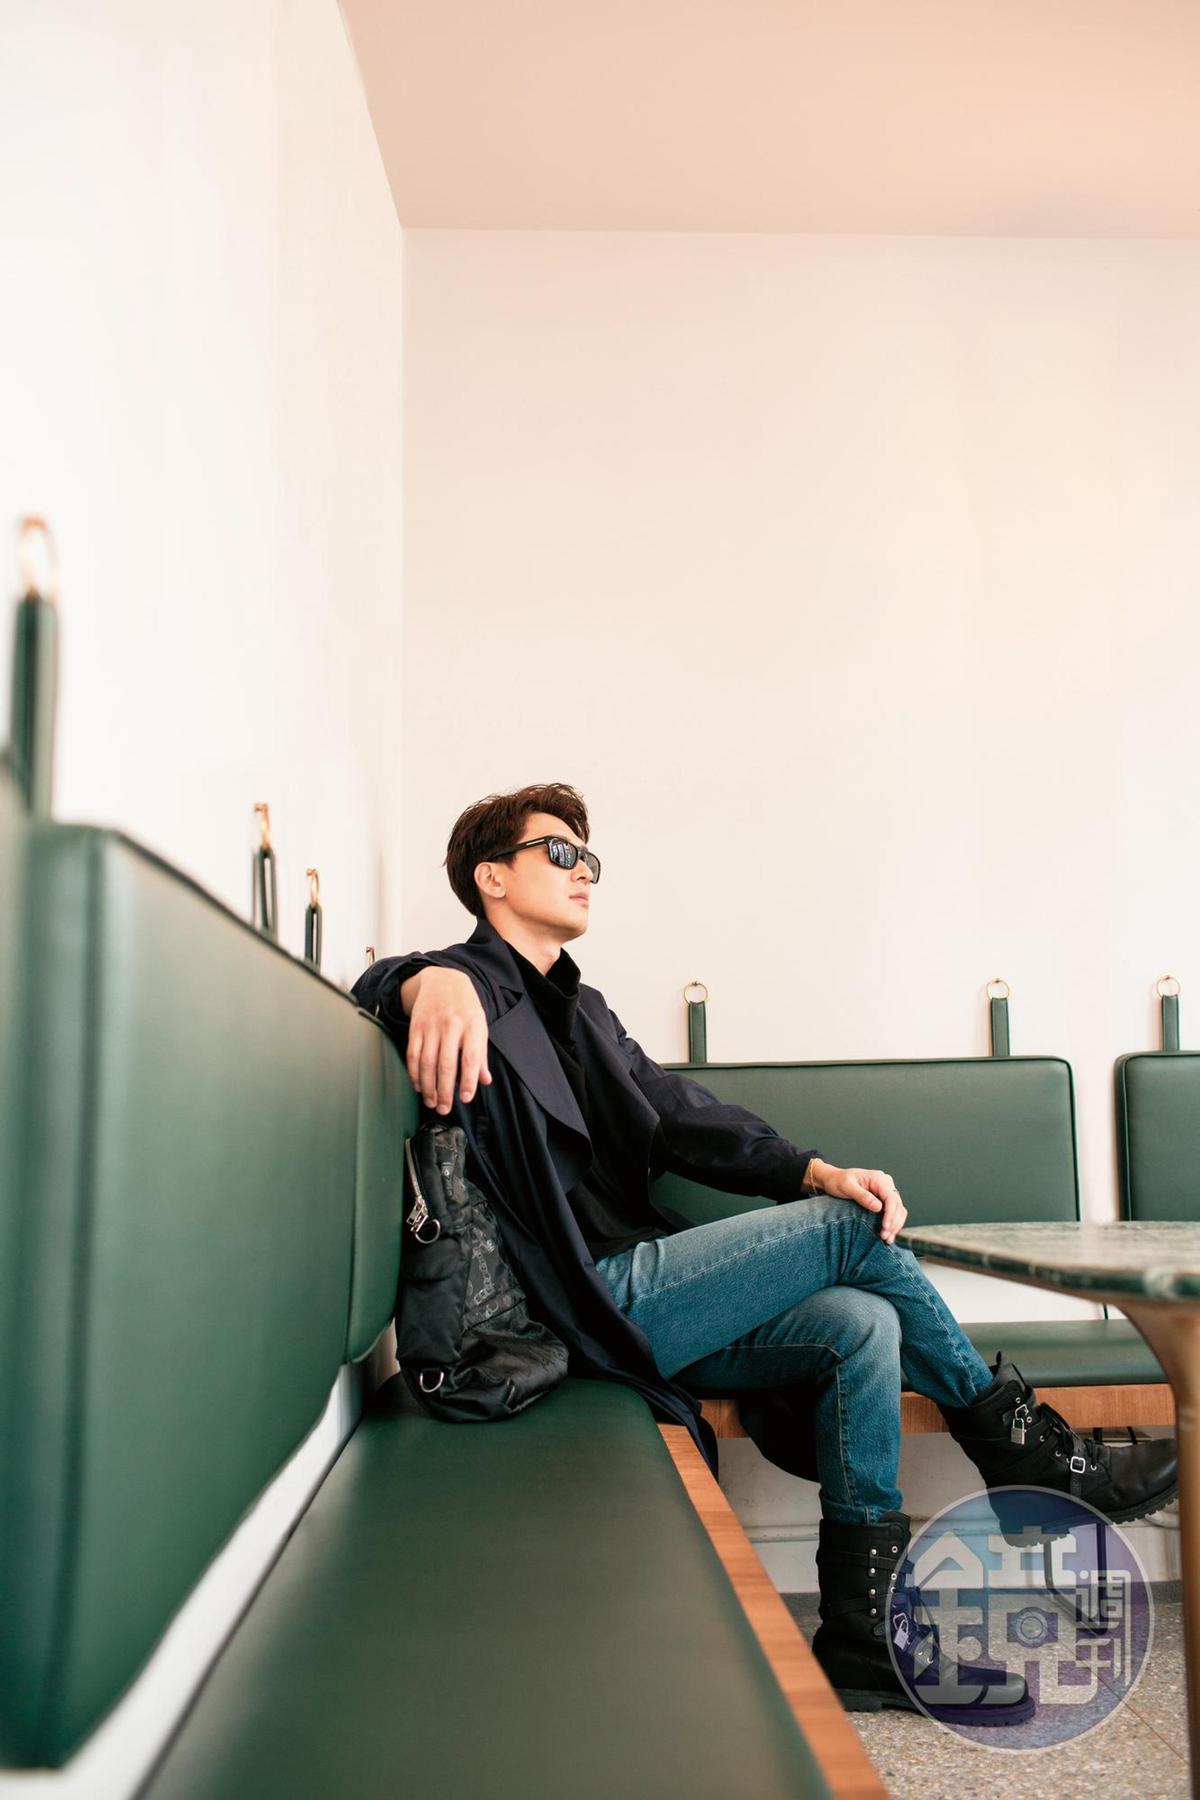 PRADA膠框墨鏡。約NT$10,000/Jolin Wu林果設計高領上衣。NT$5,500/Jolin Wu林果設計長版風衣。NT$18,900/LEVI'S牛仔褲。NT$3,990/前經紀人送的adidas x Jermy Scott高筒靴子。無價